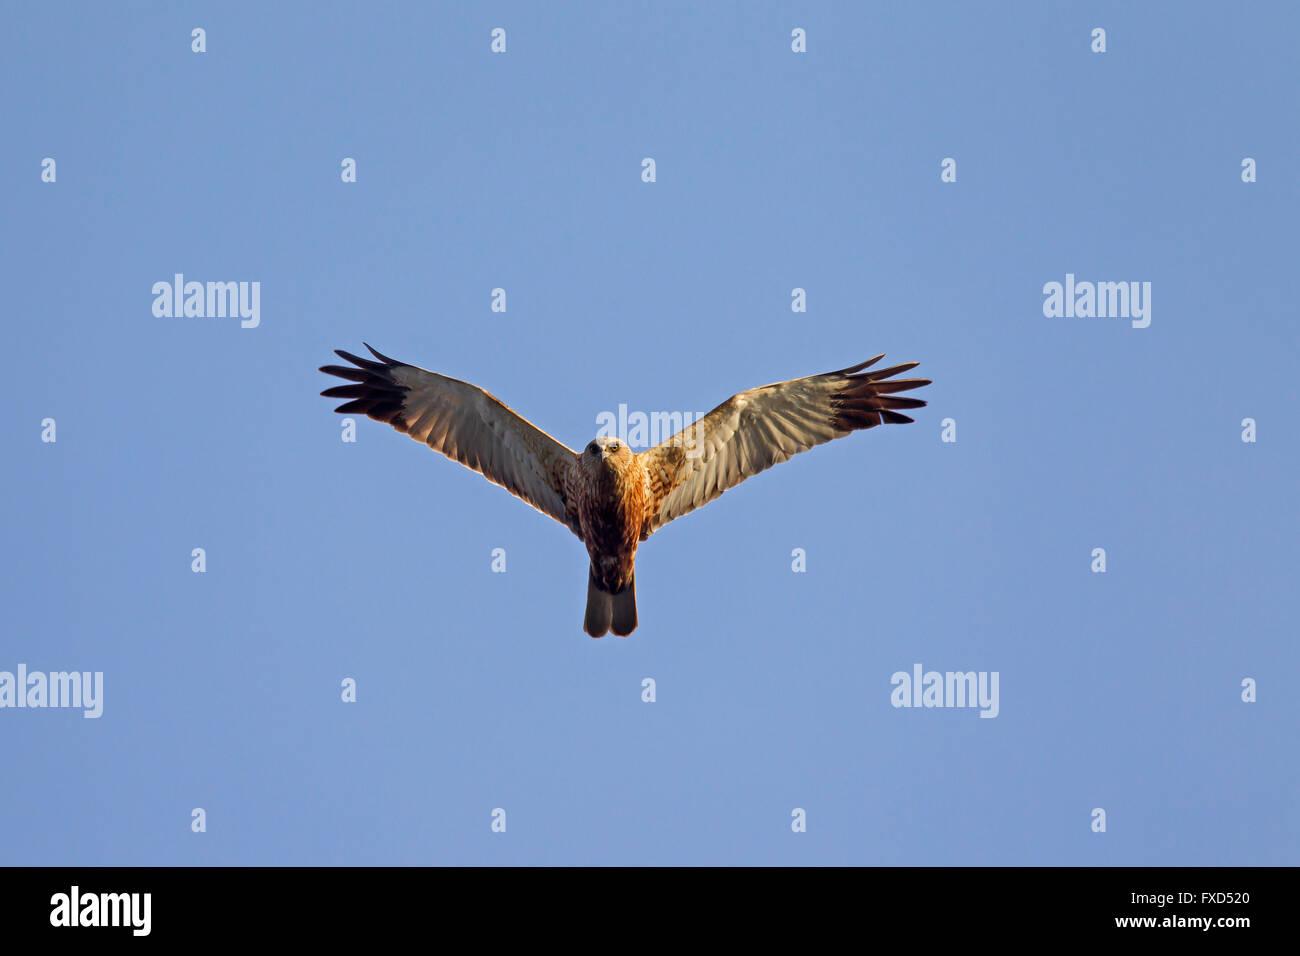 Western marsh harrier / Eurasian marsh harrier (Circus aeruginosus), male in flight Stock Photo